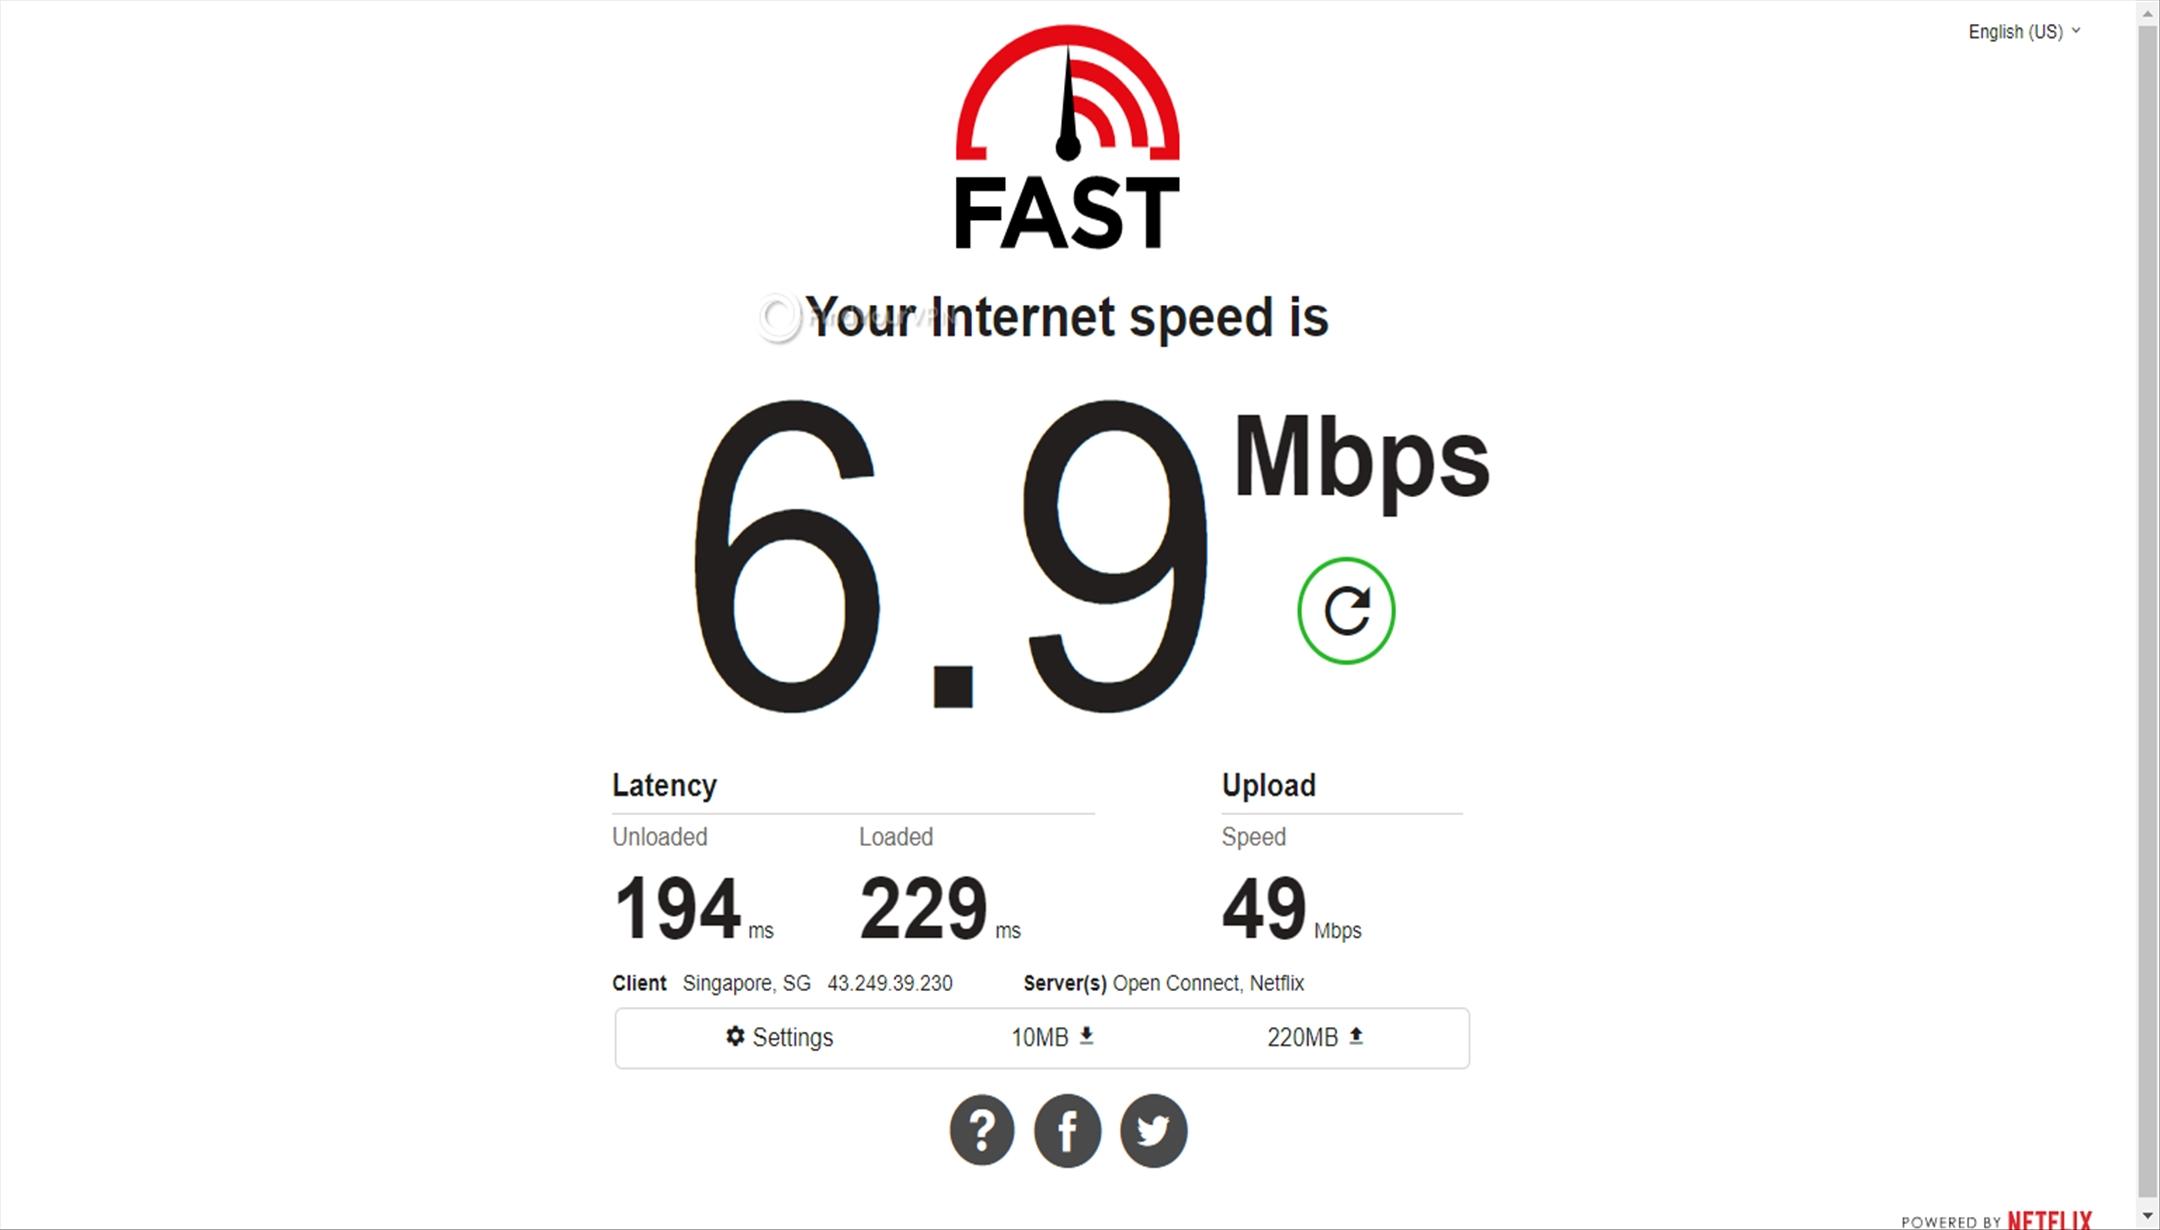 The speed test results for BolehVPN's Singapore server